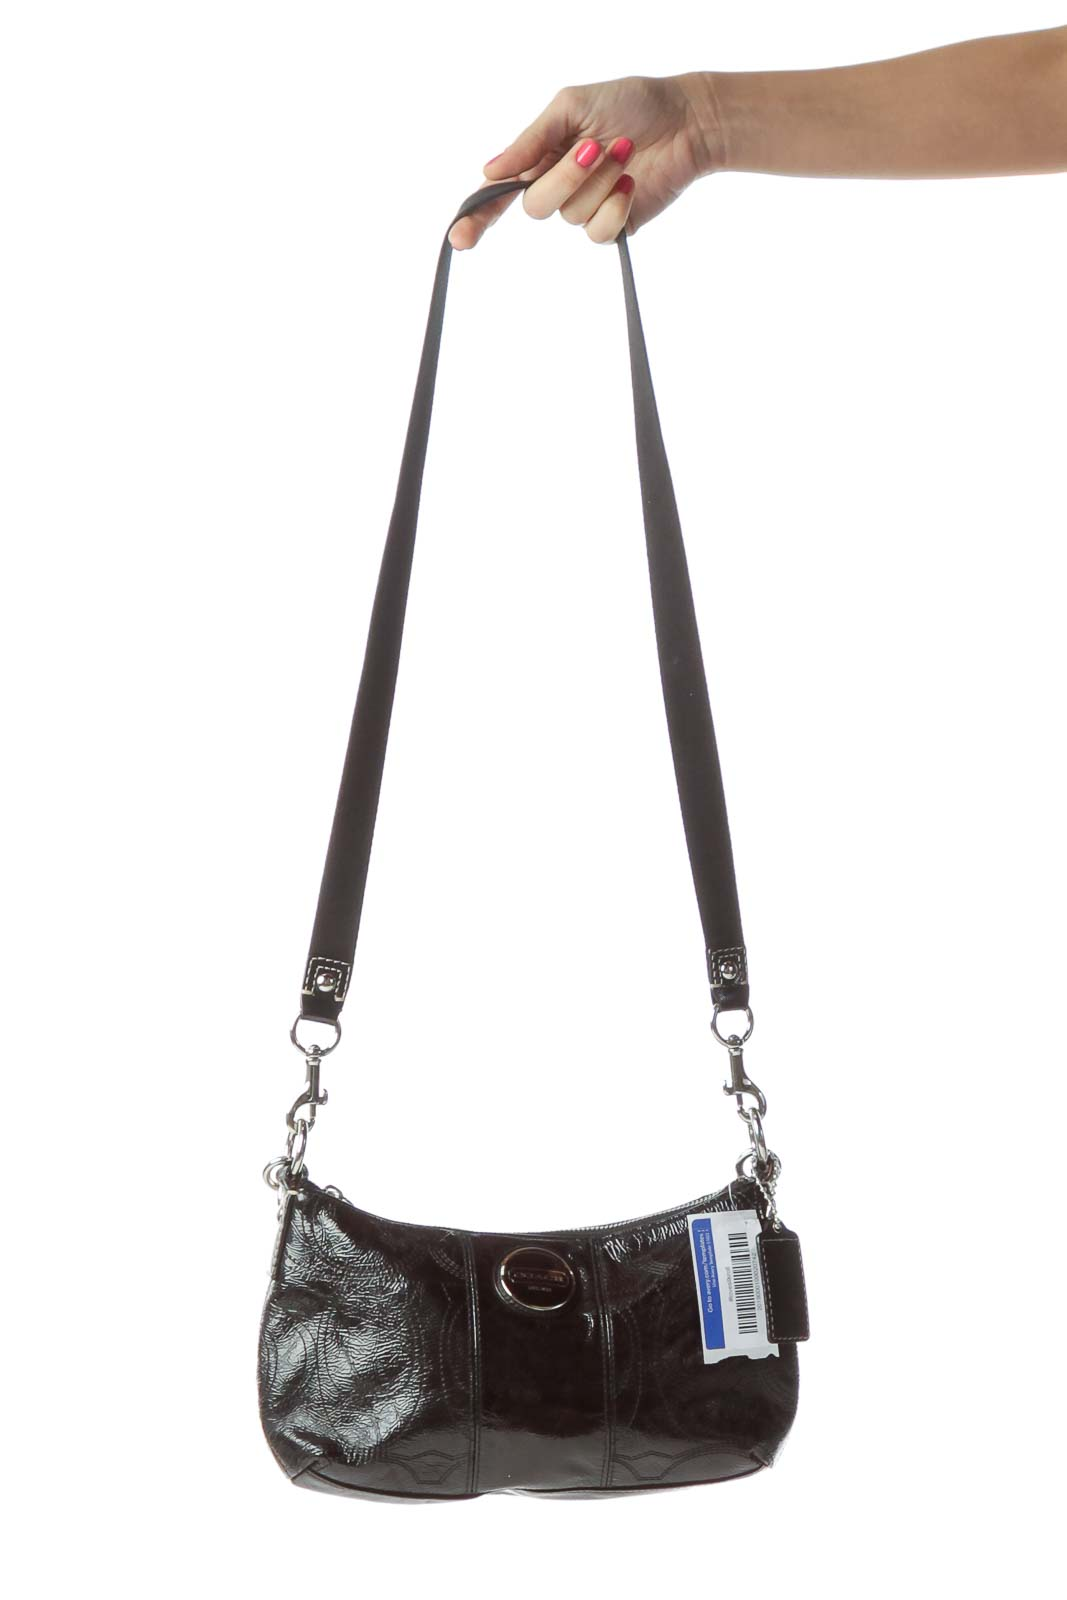 Black Patent Leather Crossbody Bag